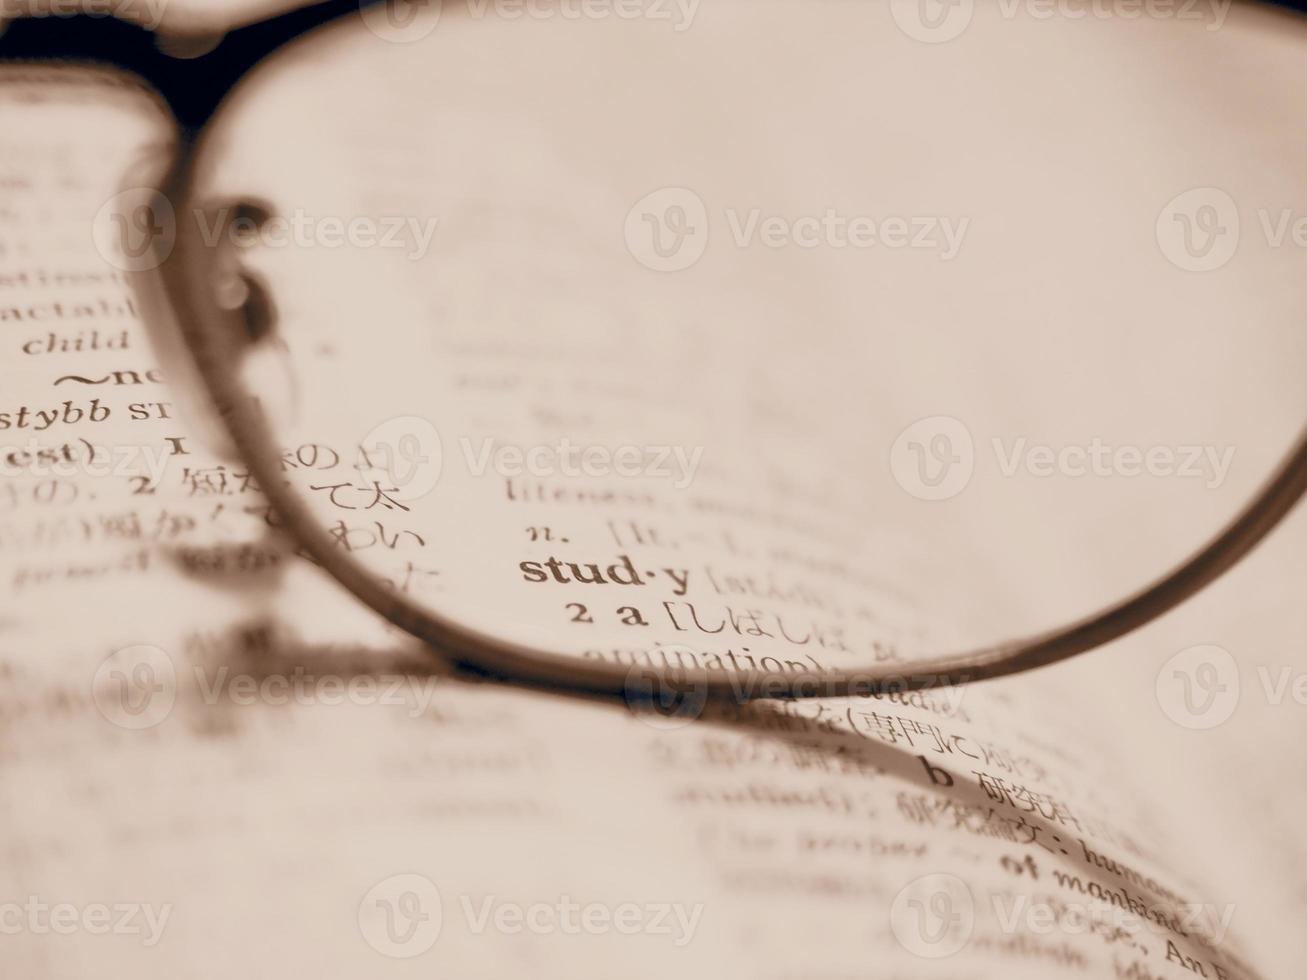 studiando inglese foto